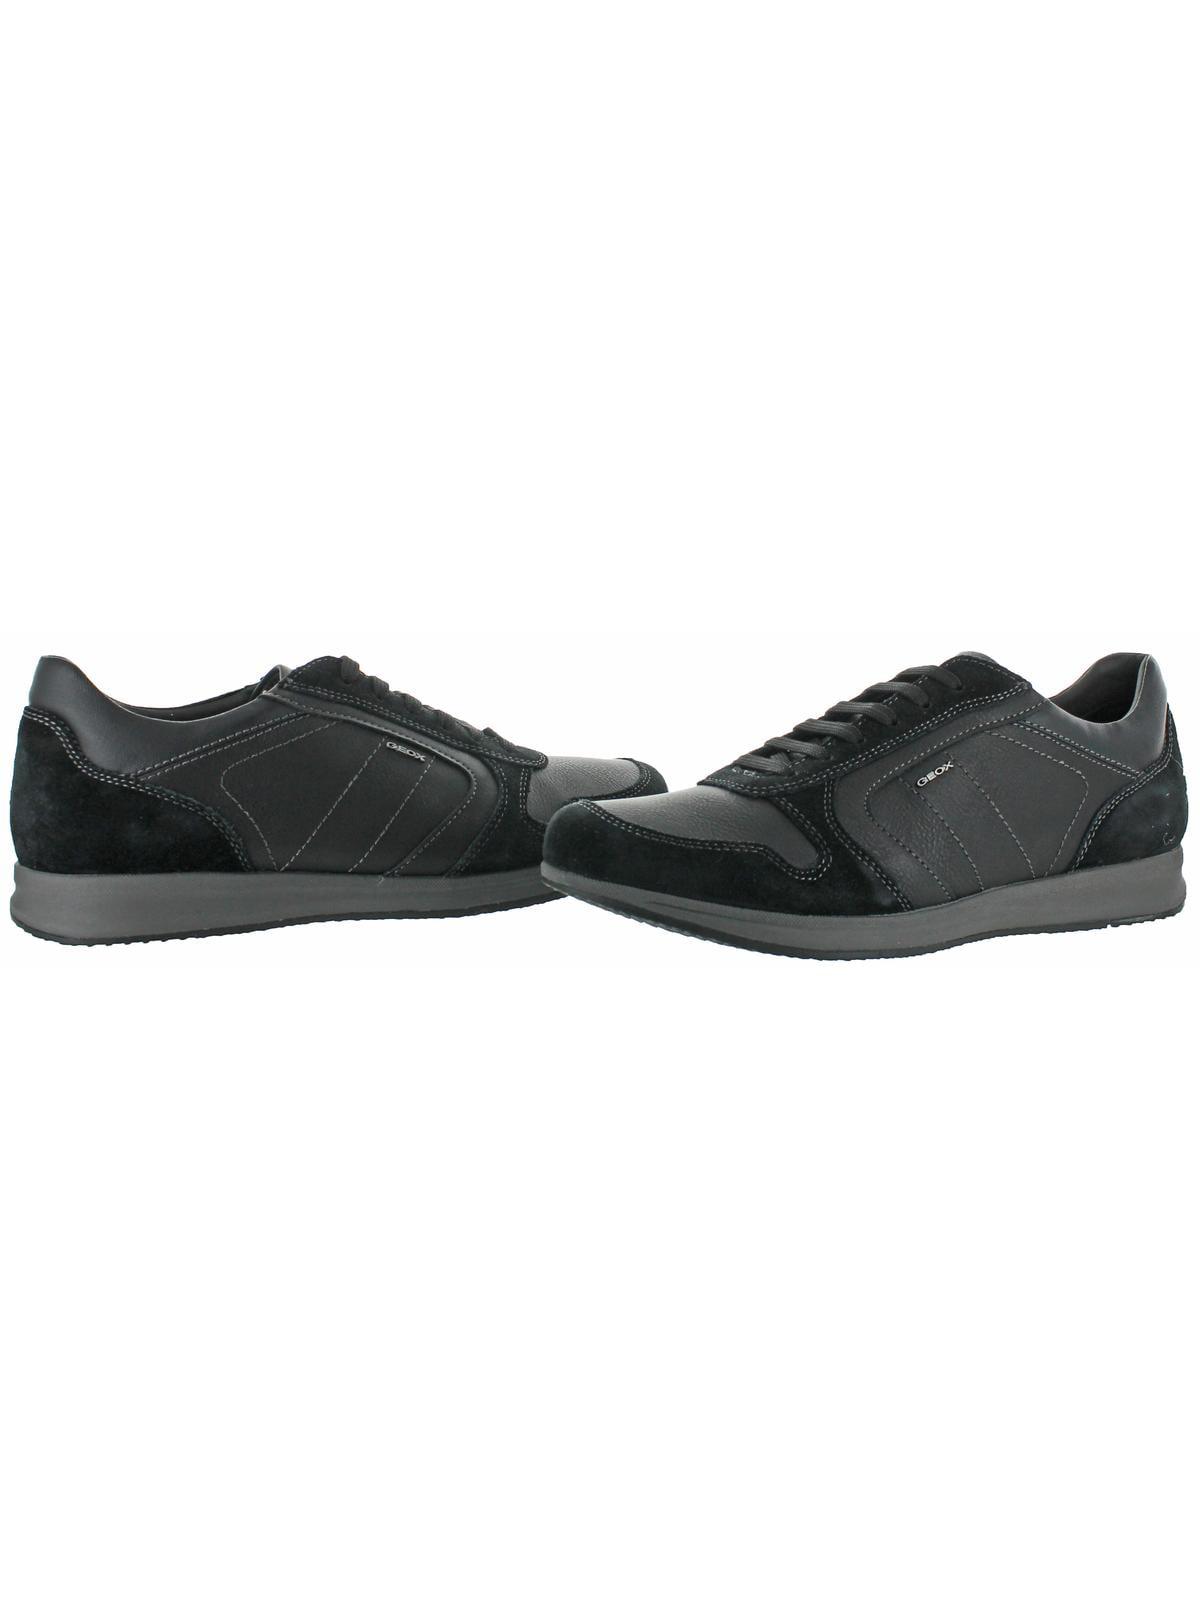 660568b4b7 Geox - Geox Avery Men's Fashion Casual Shoes Sneakers Black Size 11 -  Walmart.com